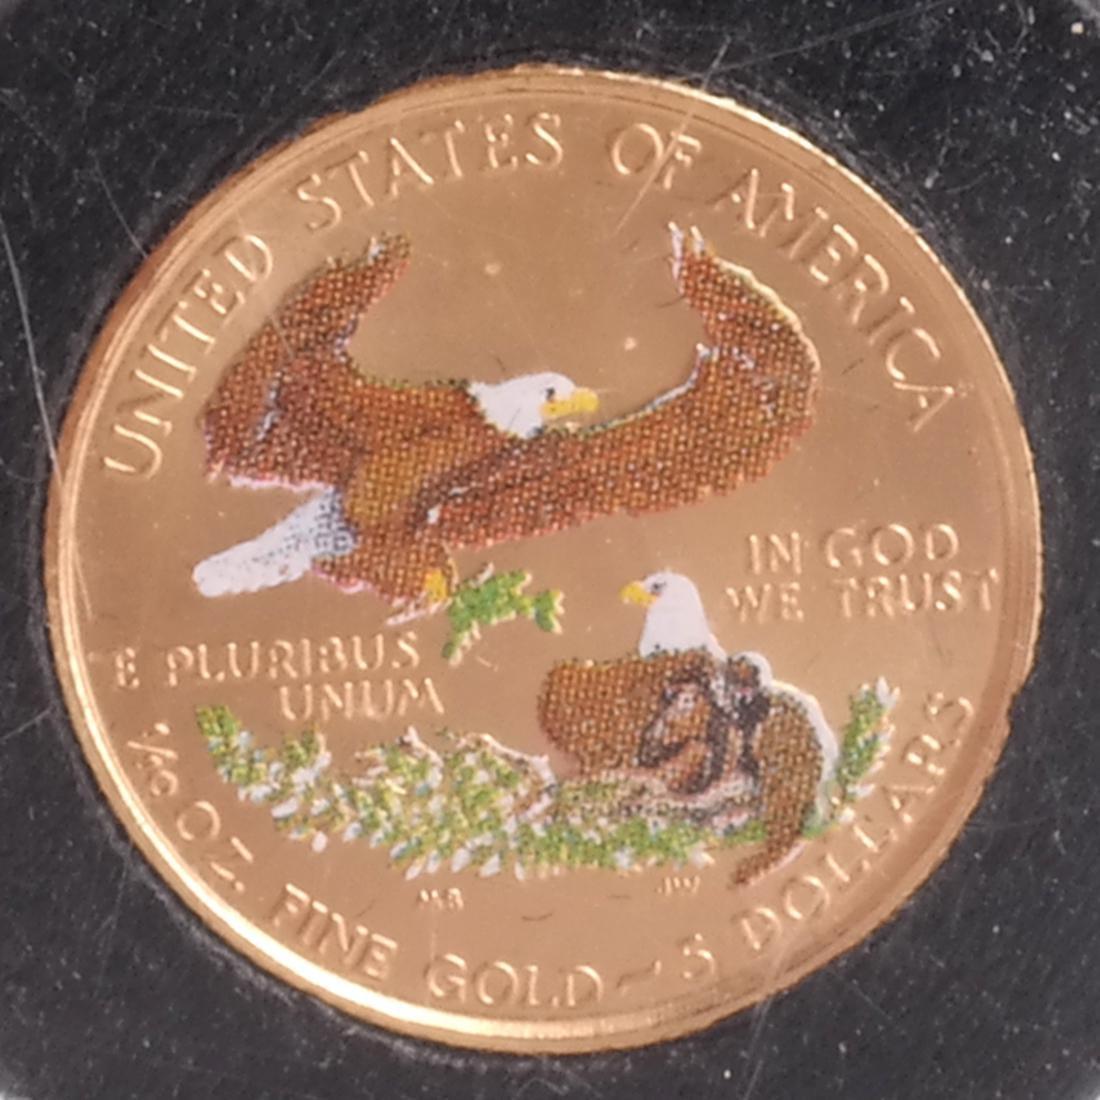 1999 Gold Eagle, Bicentennial, Kennedy - 7